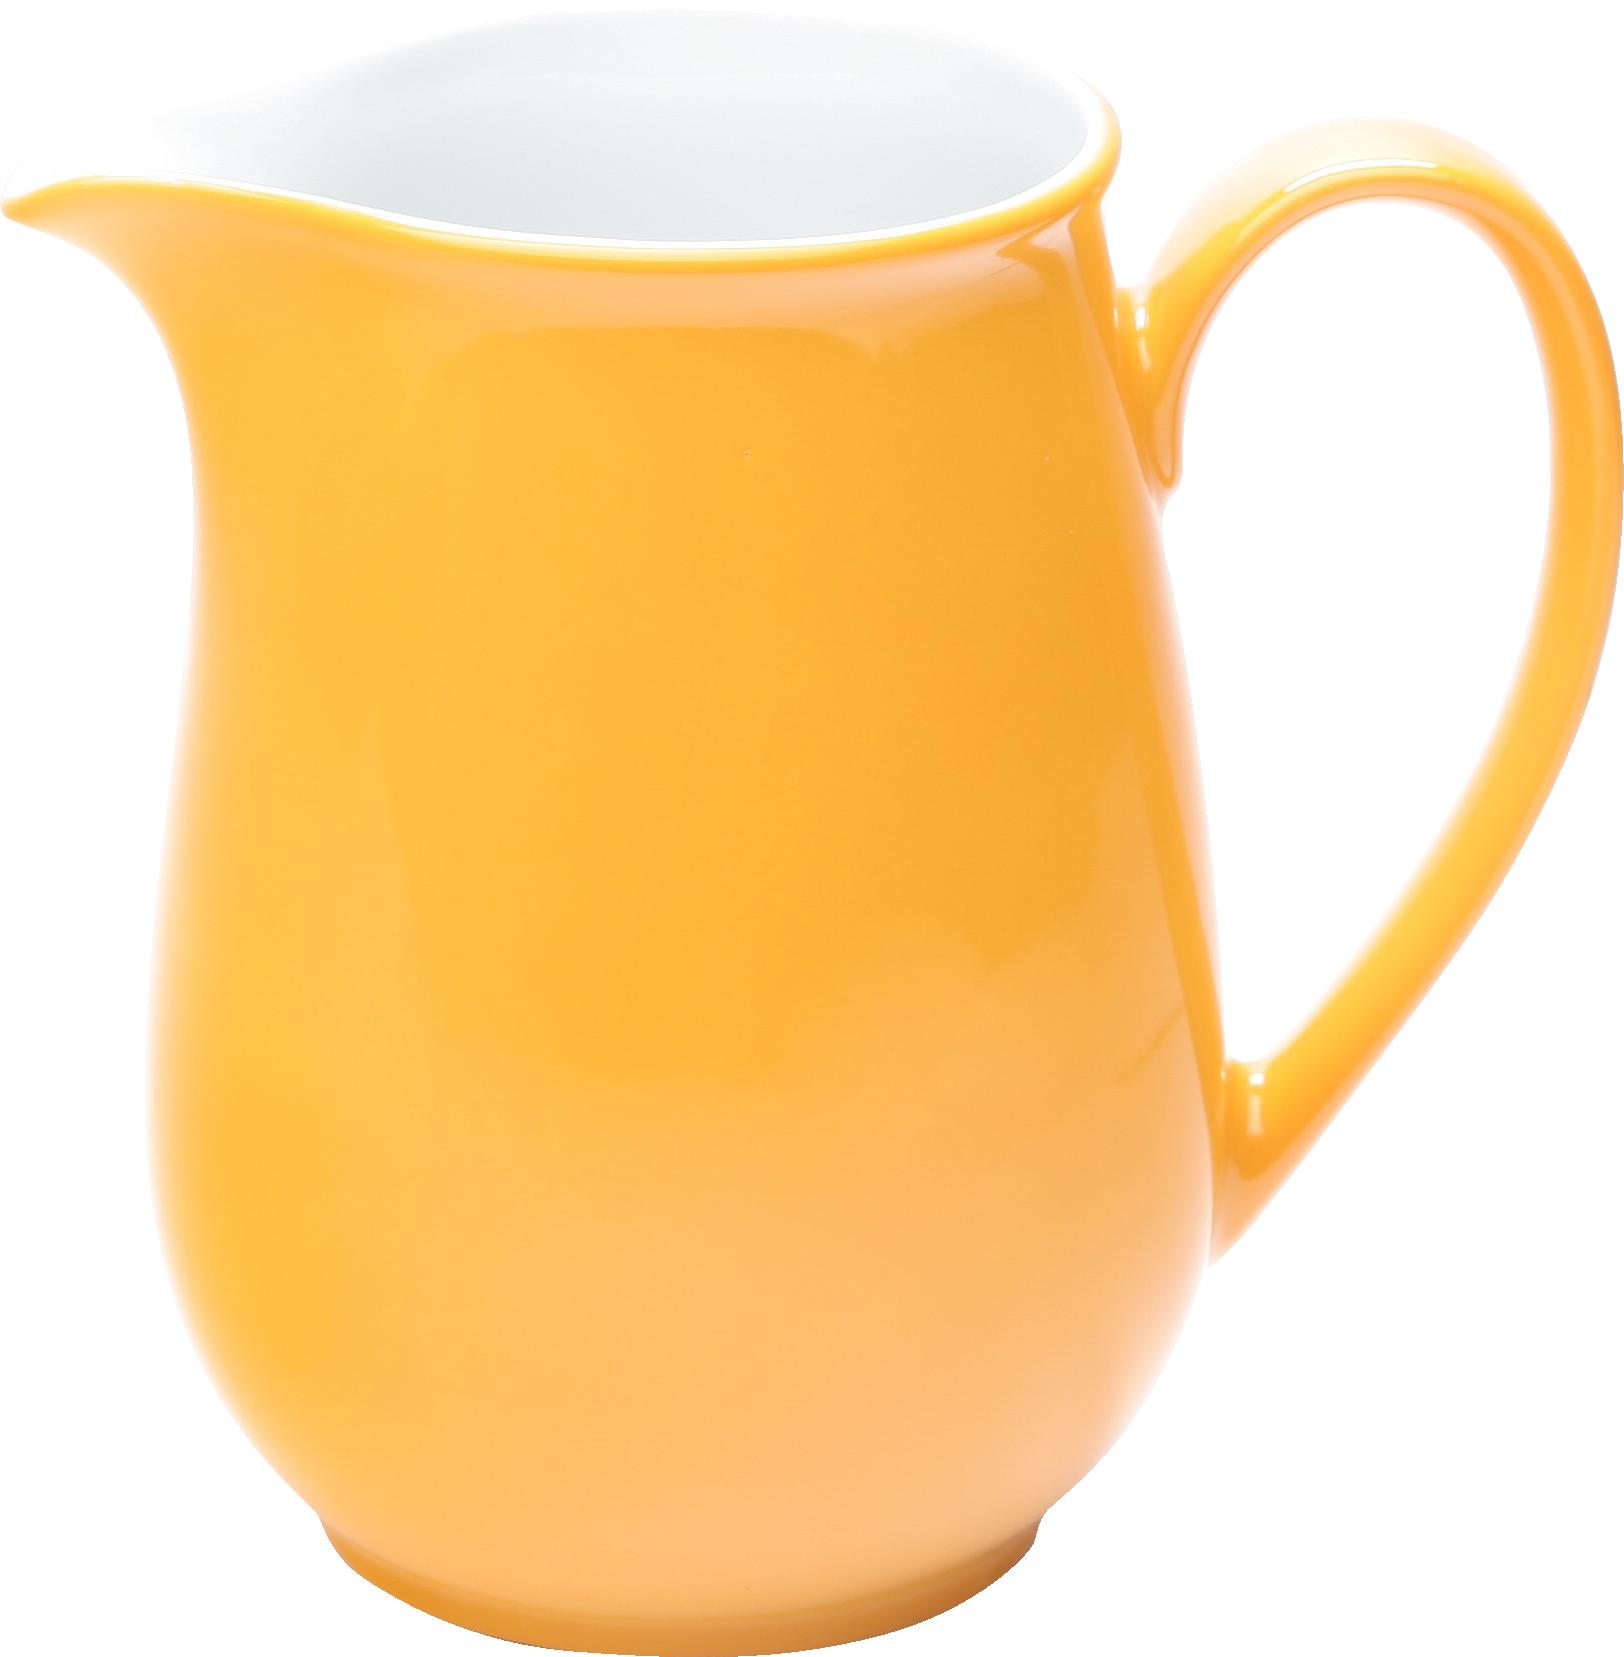 Pronto Colore Krug 1,30 l orangegelb, KAHLA Porzellan